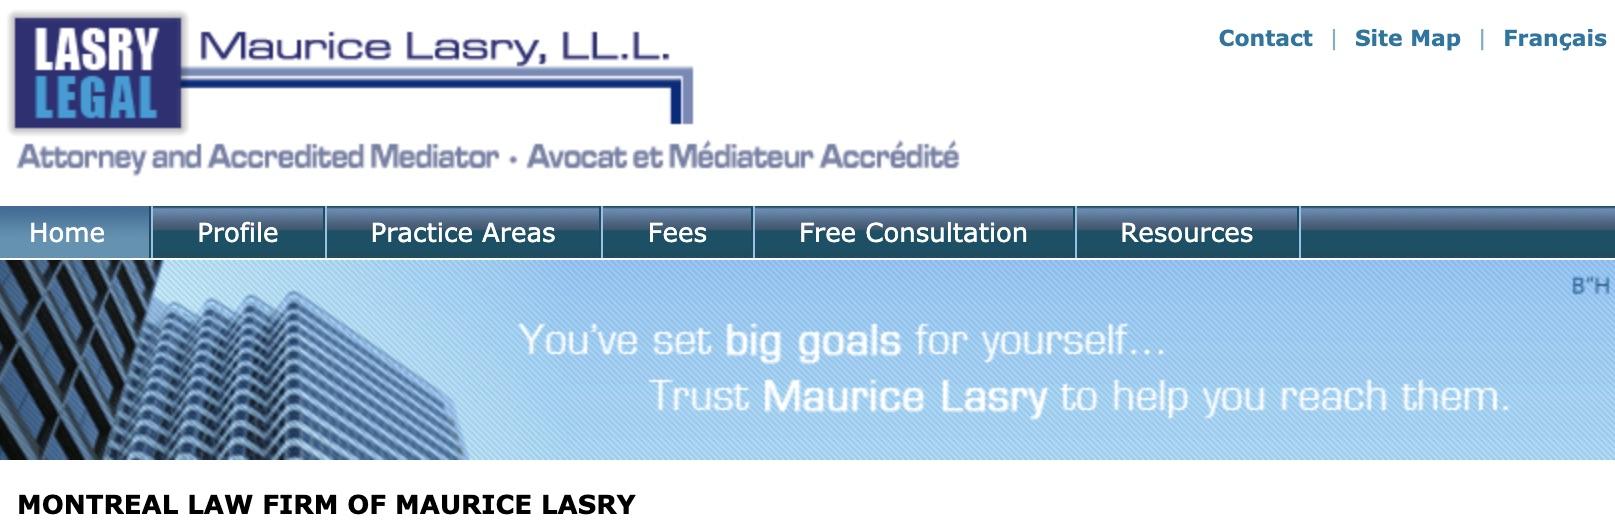 Maurice Lasry - Avocat et Médiateur accrédité | Attorney and Accredited Mediator